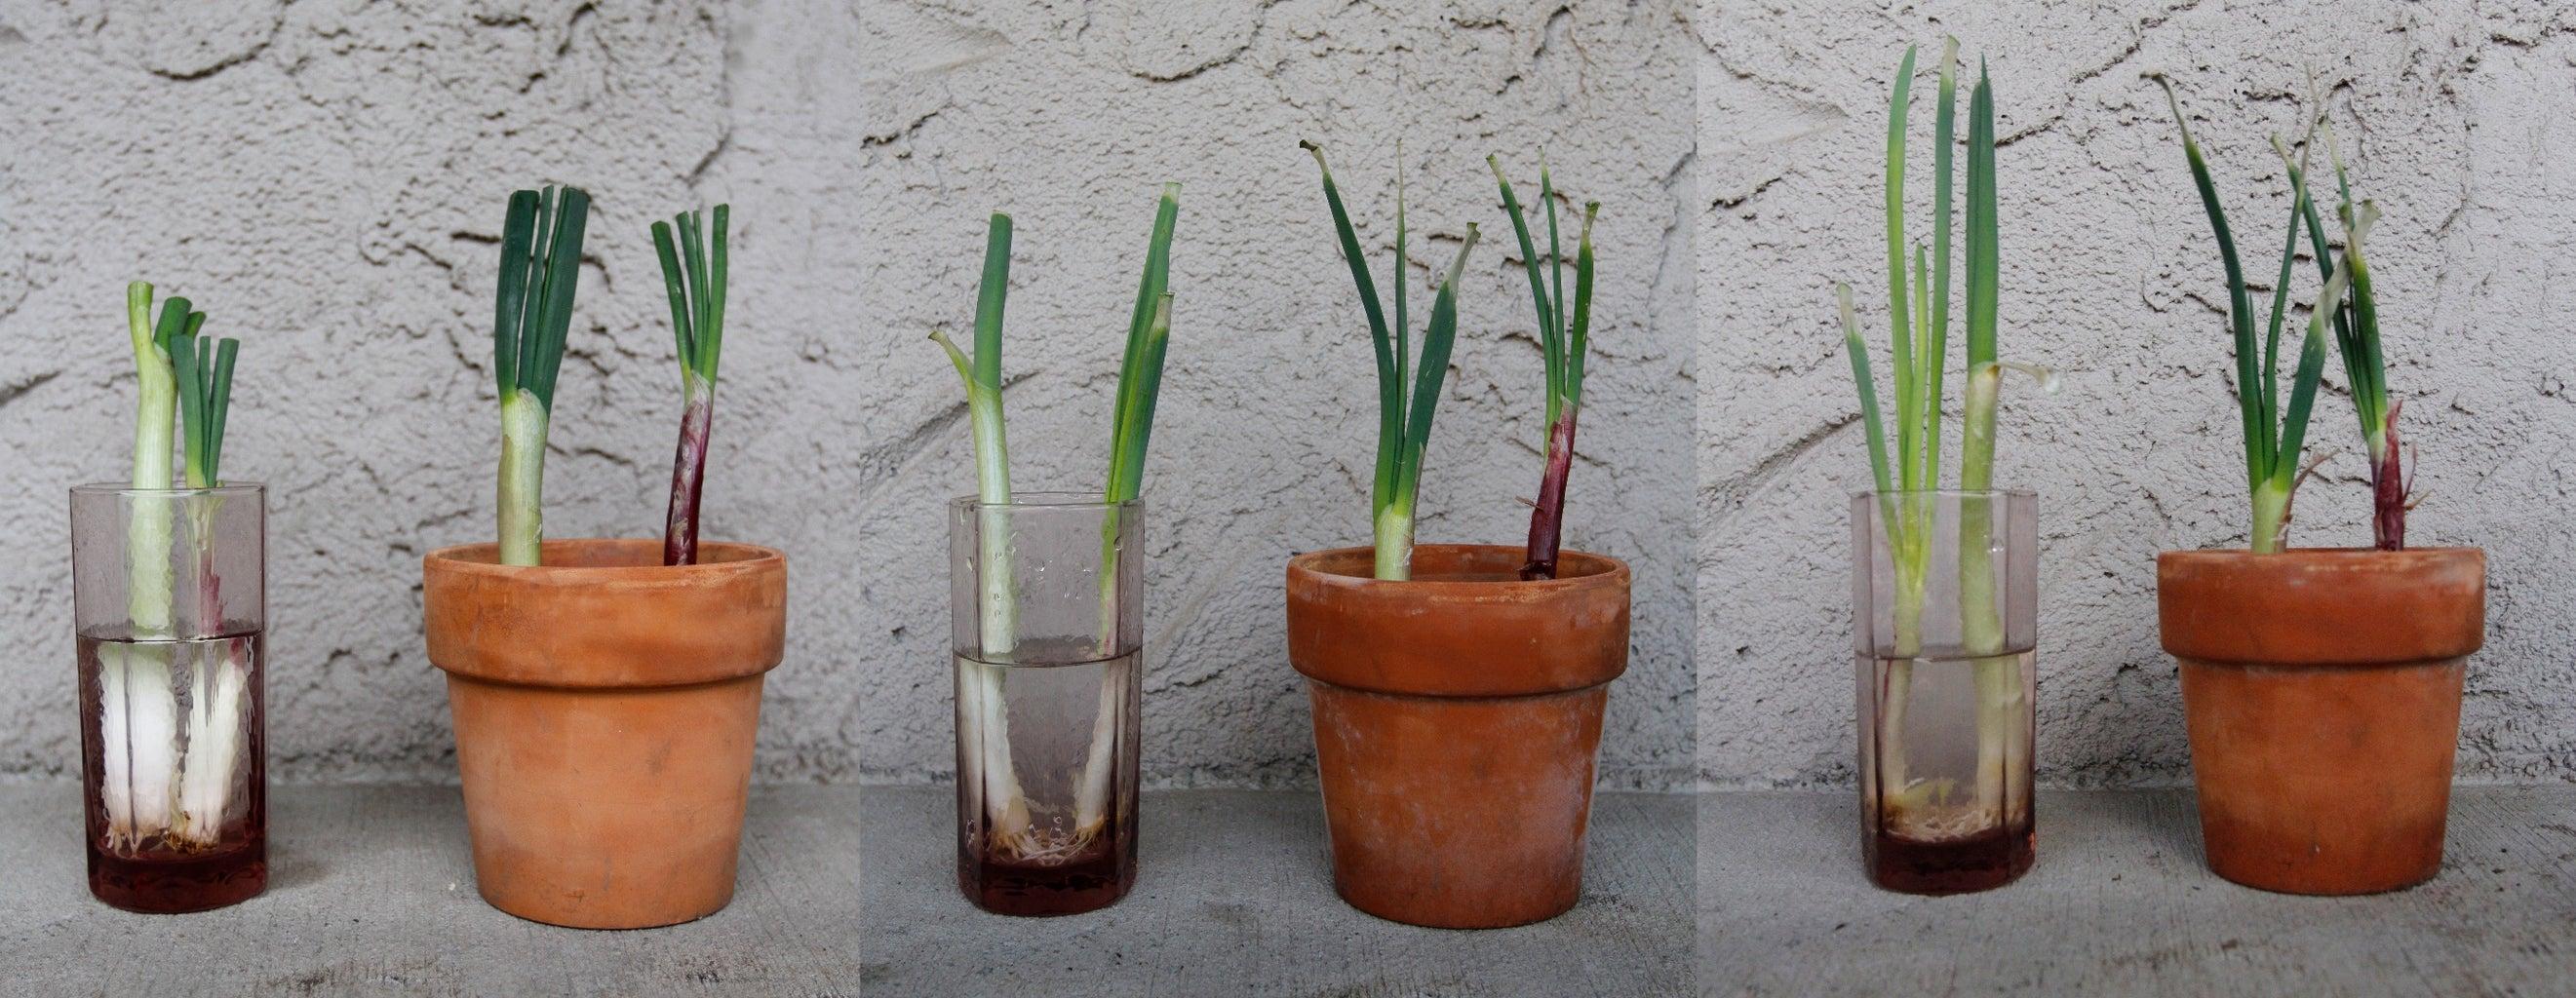 Watch As the Onions Grow